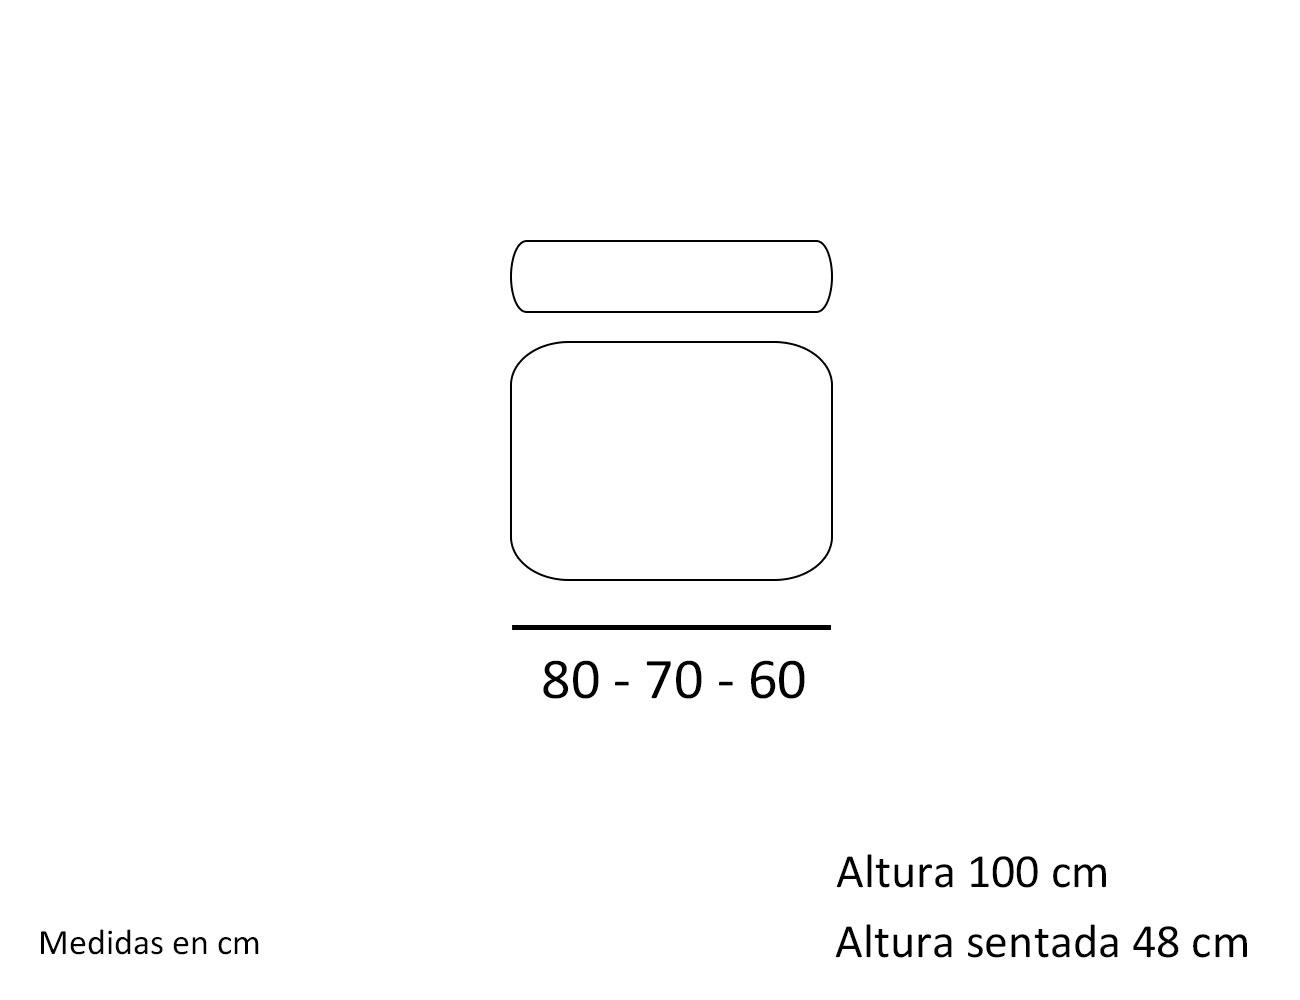 Croquis modulo 1 plaza sin brazo 60 70 803